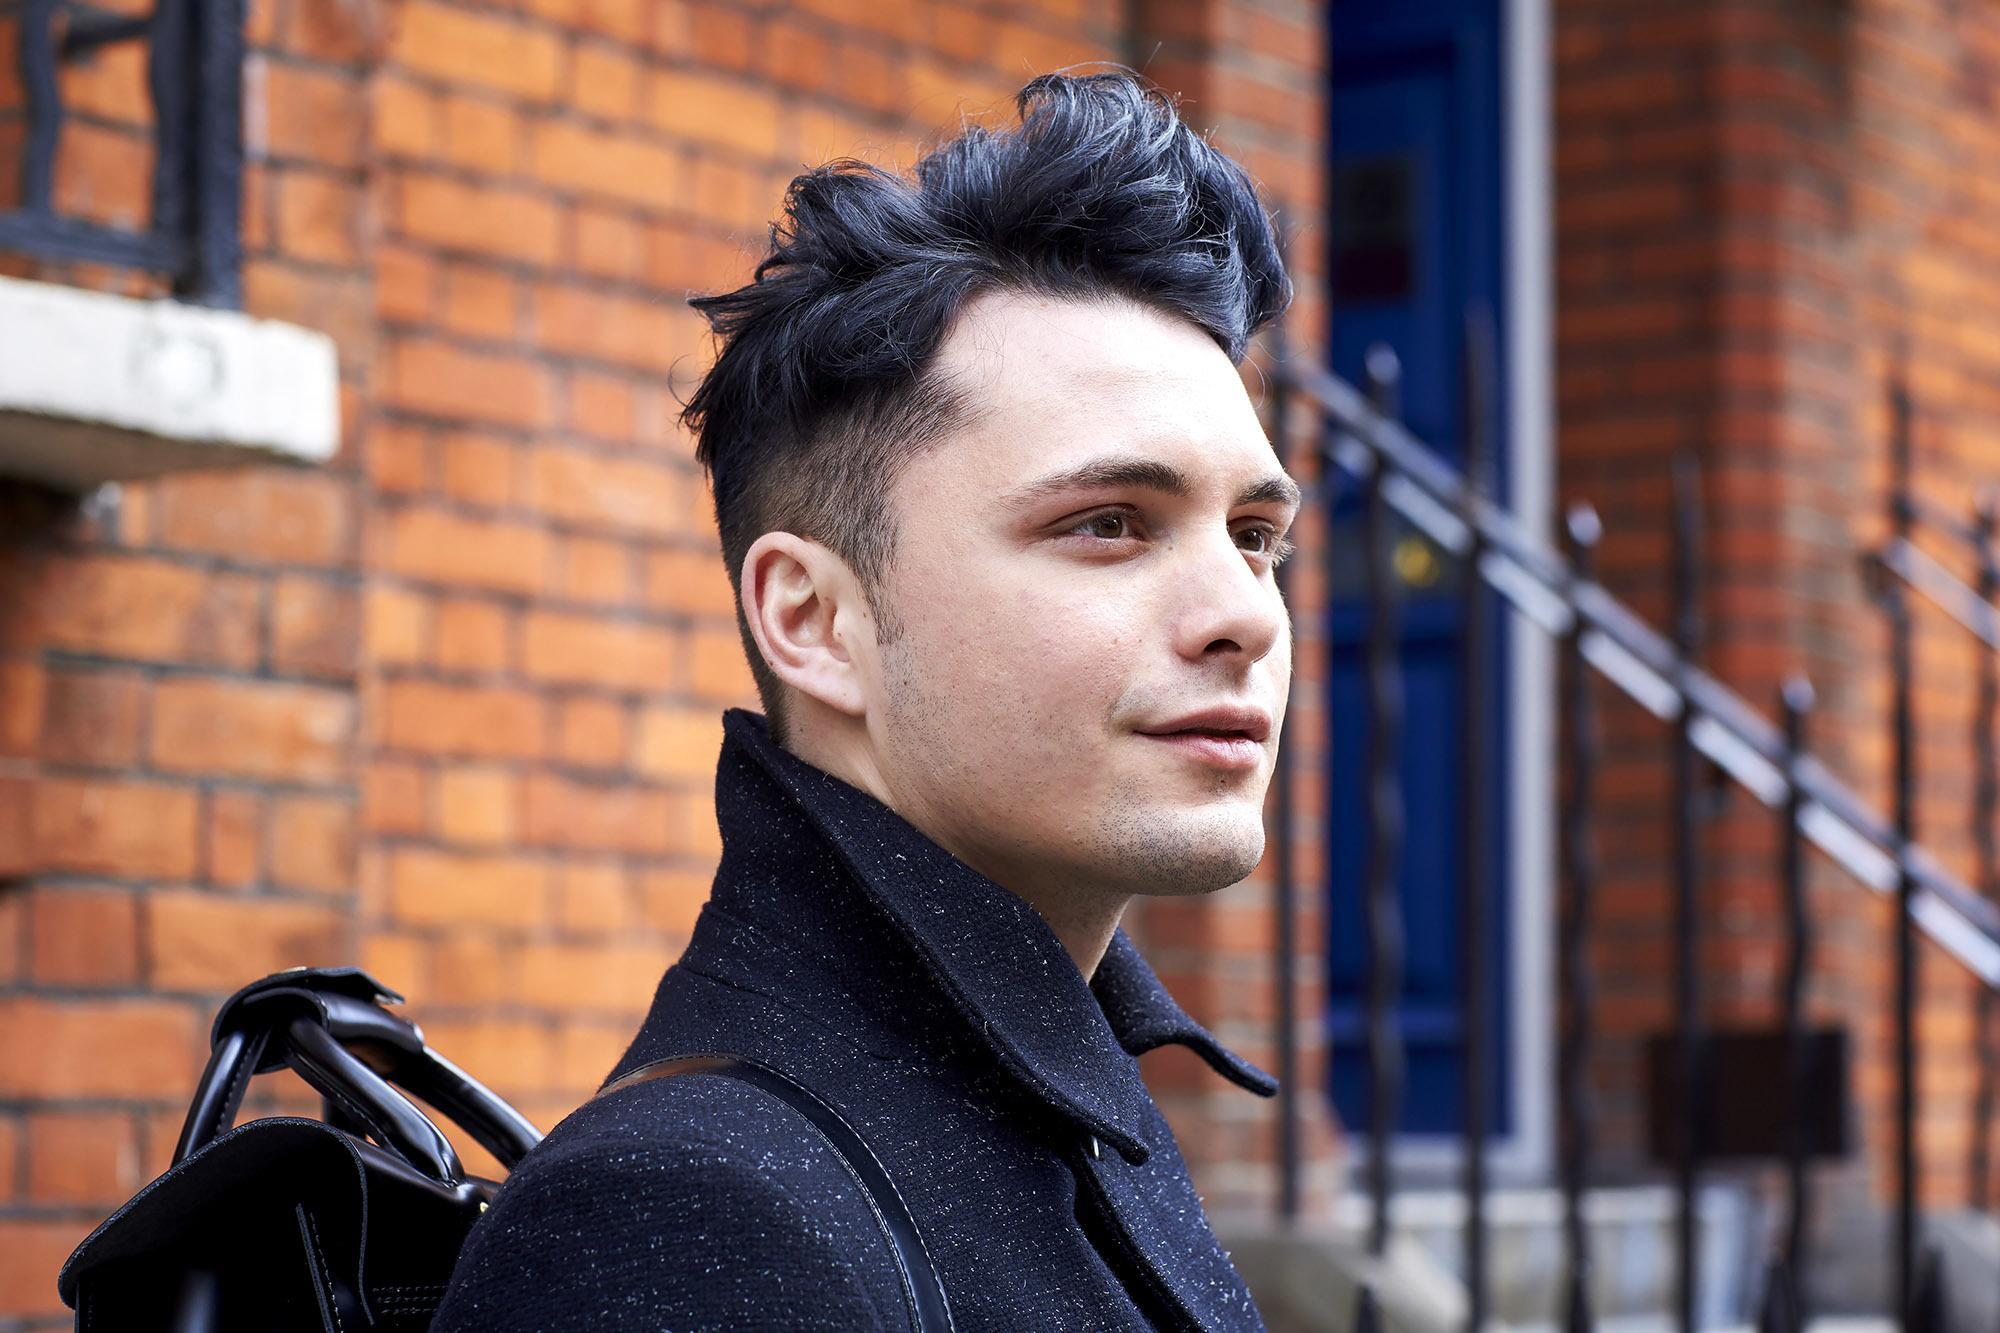 Male with undercut hair